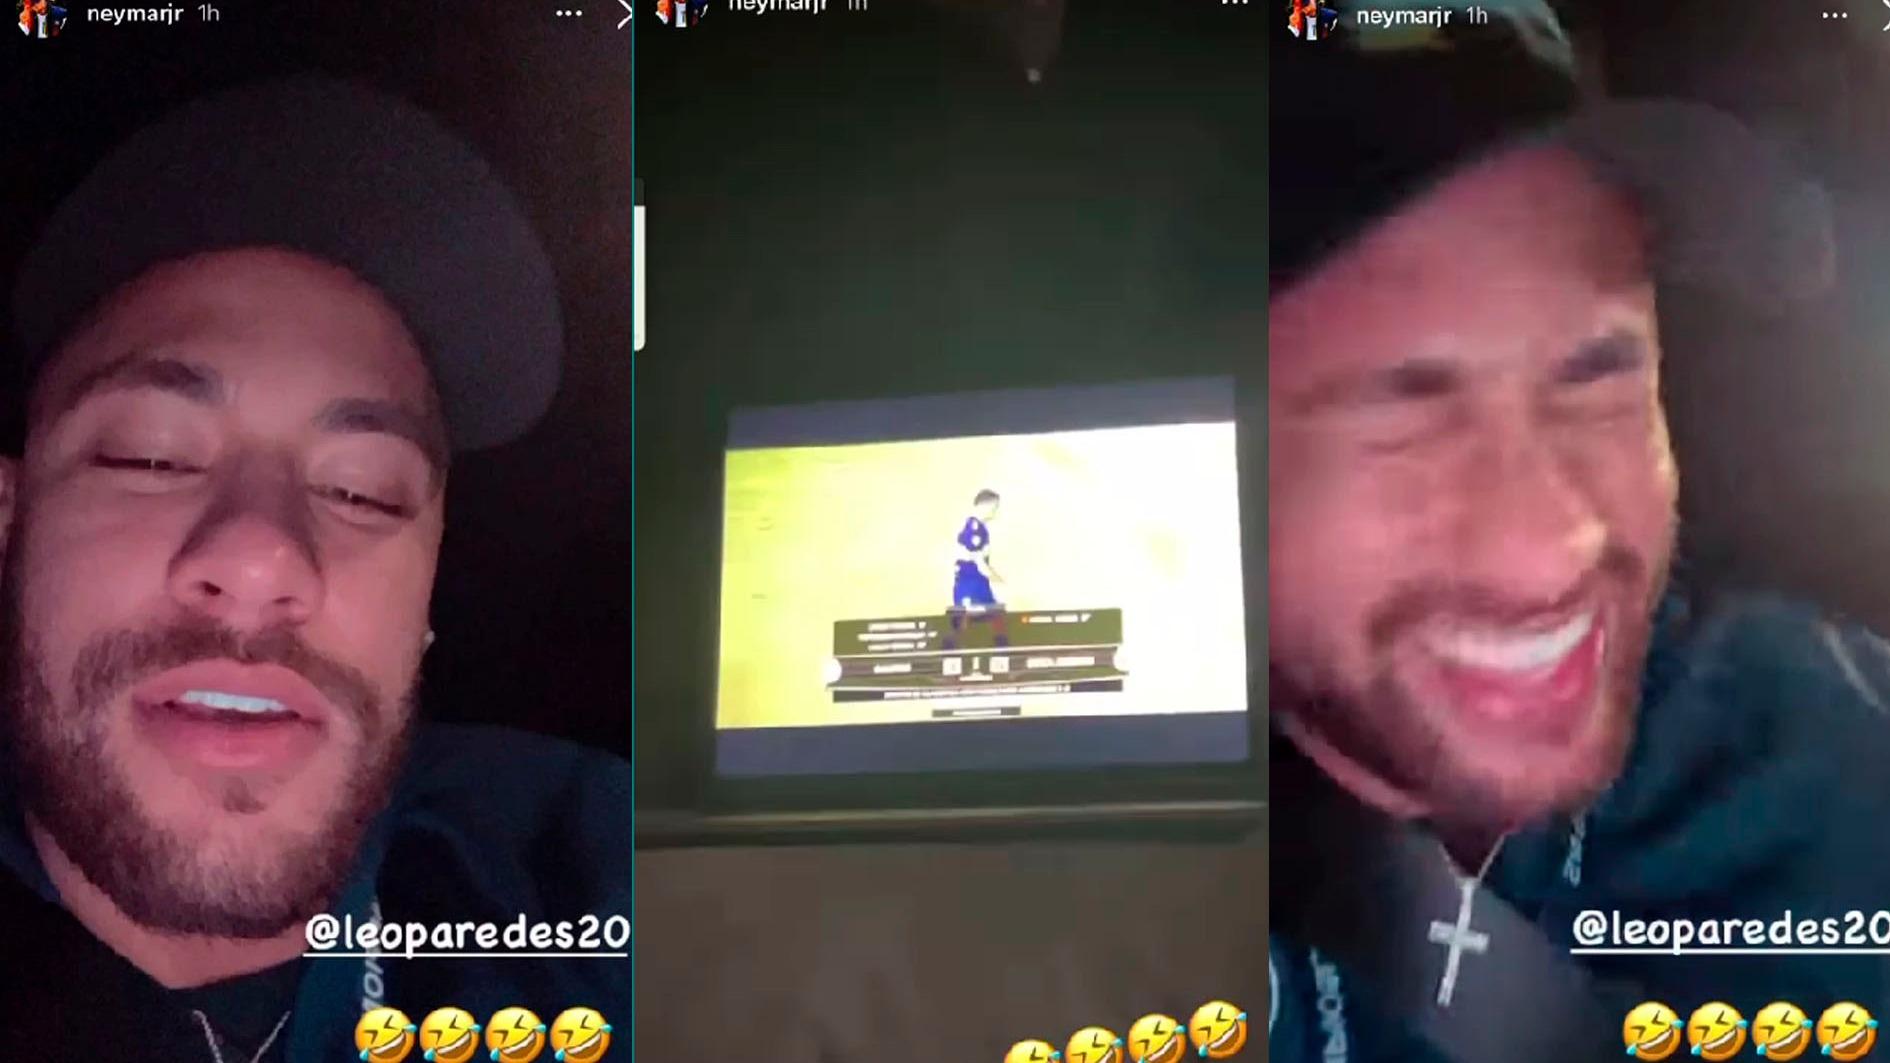 Neymar le ganó una apuesta a Leo Paredes.